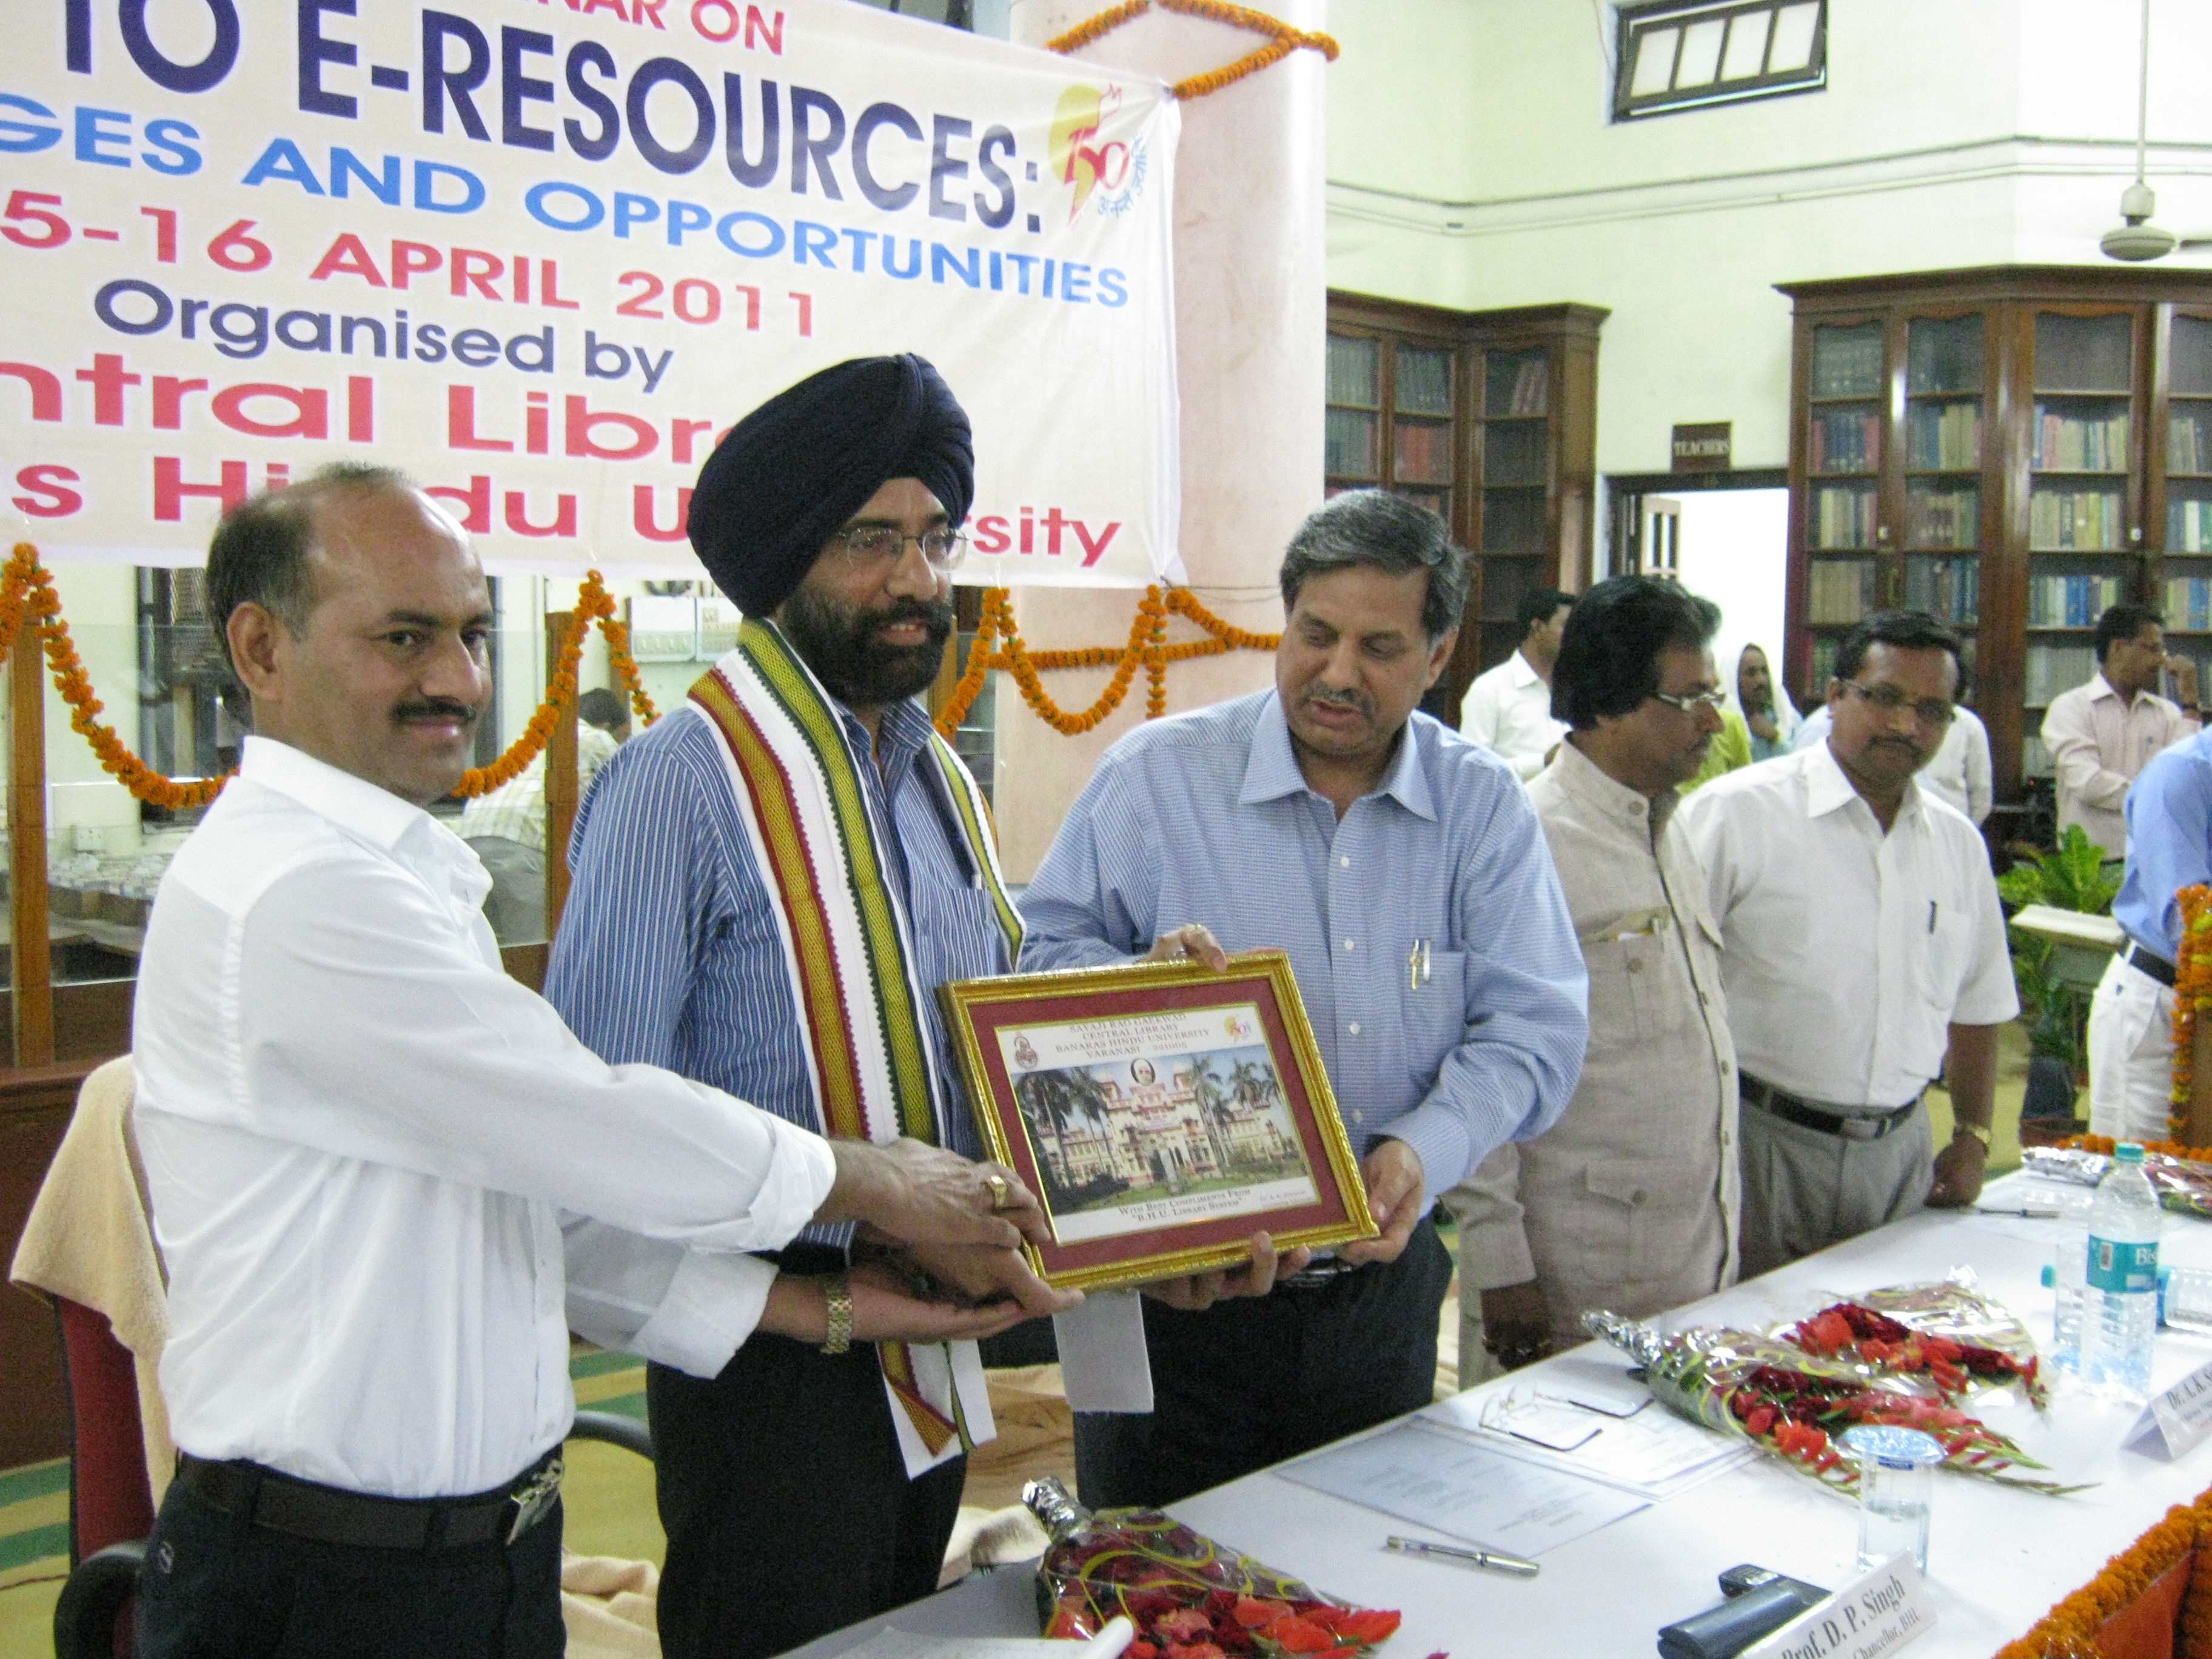 BHU Seminar on Print to E-Resources